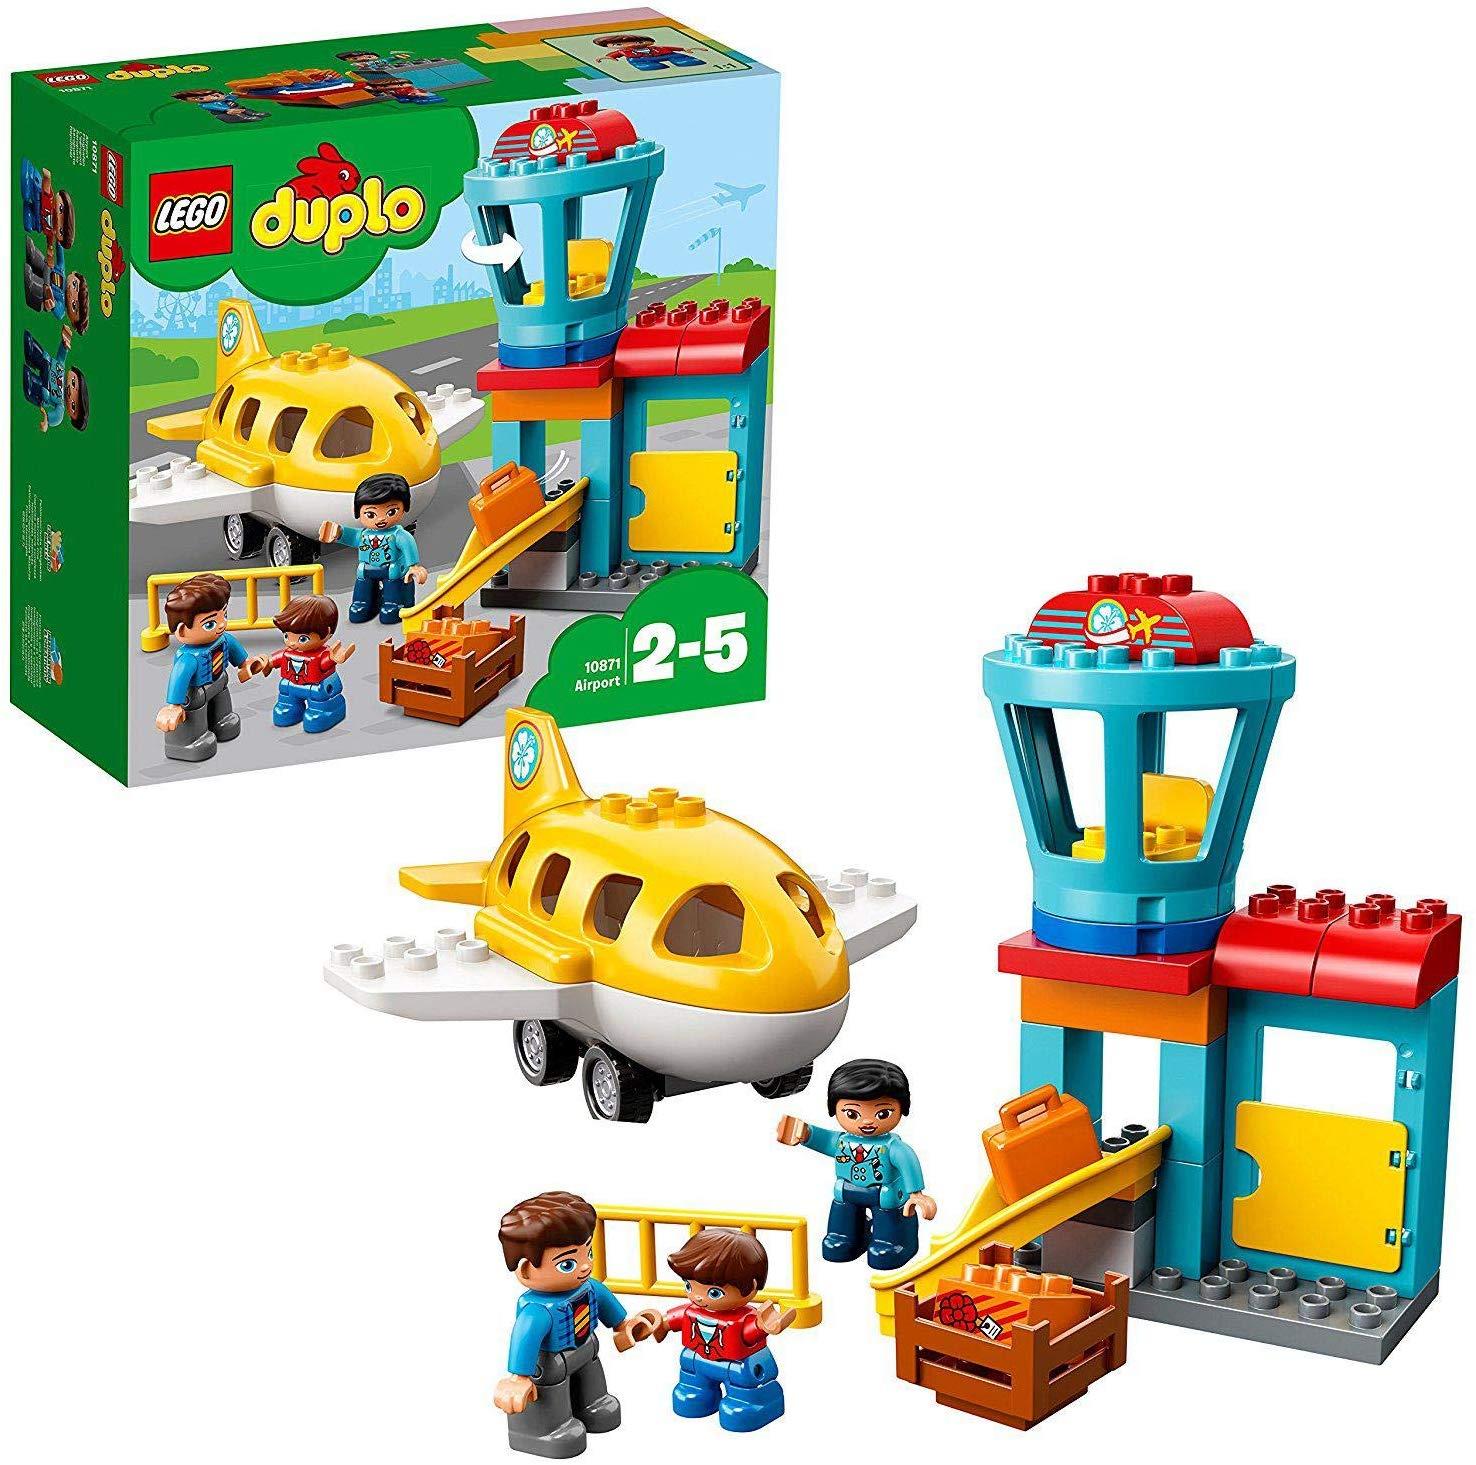 LEGO 10871 DUPLO Town Airport Building Bricks Set with Aeroplane £14.49 + £4.49 NP @ Amazon